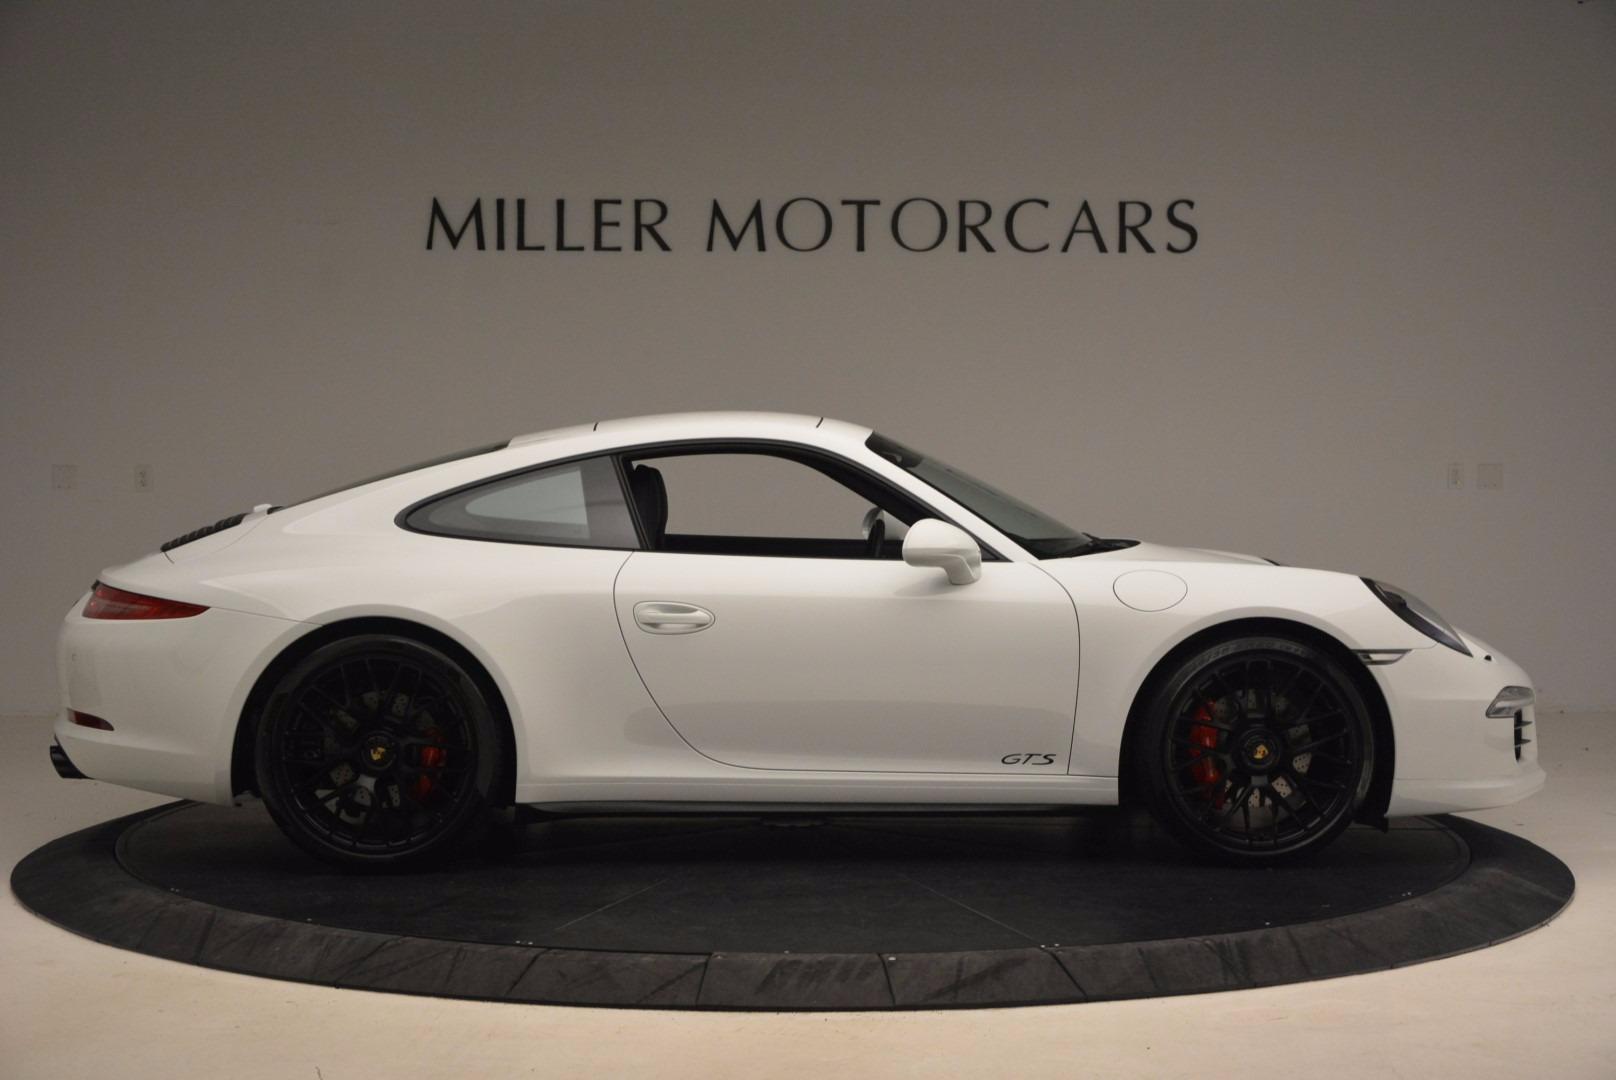 Used 2015 Porsche 911 Carrera GTS For Sale In Greenwich, CT 1444_p9